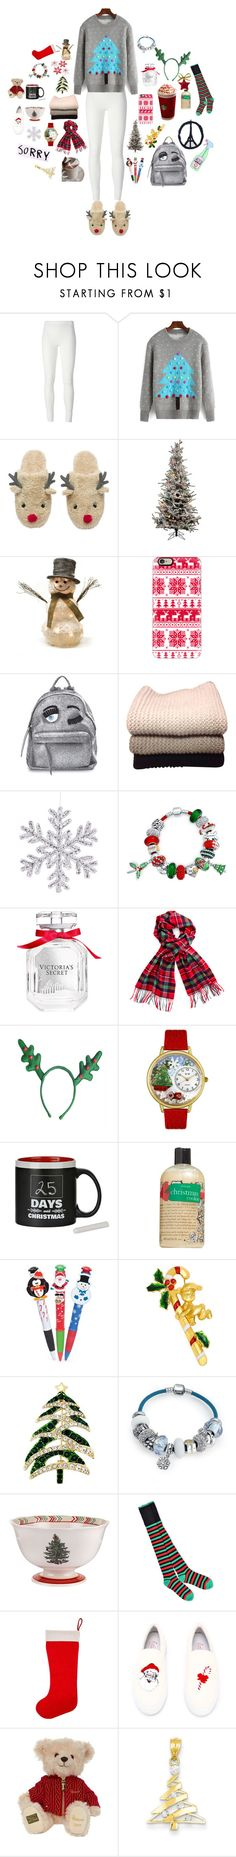 """{ Christmas }"" by itstepna ❤ liked on Polyvore featuring Rick Owens Lilies, Shea's Wildflower, Casetify, Chiara Ferragni, IRIS VON ARNIM, Bling Jewelry, Victoria's Secret, Honour, philosophy and Chicnova Fashion"